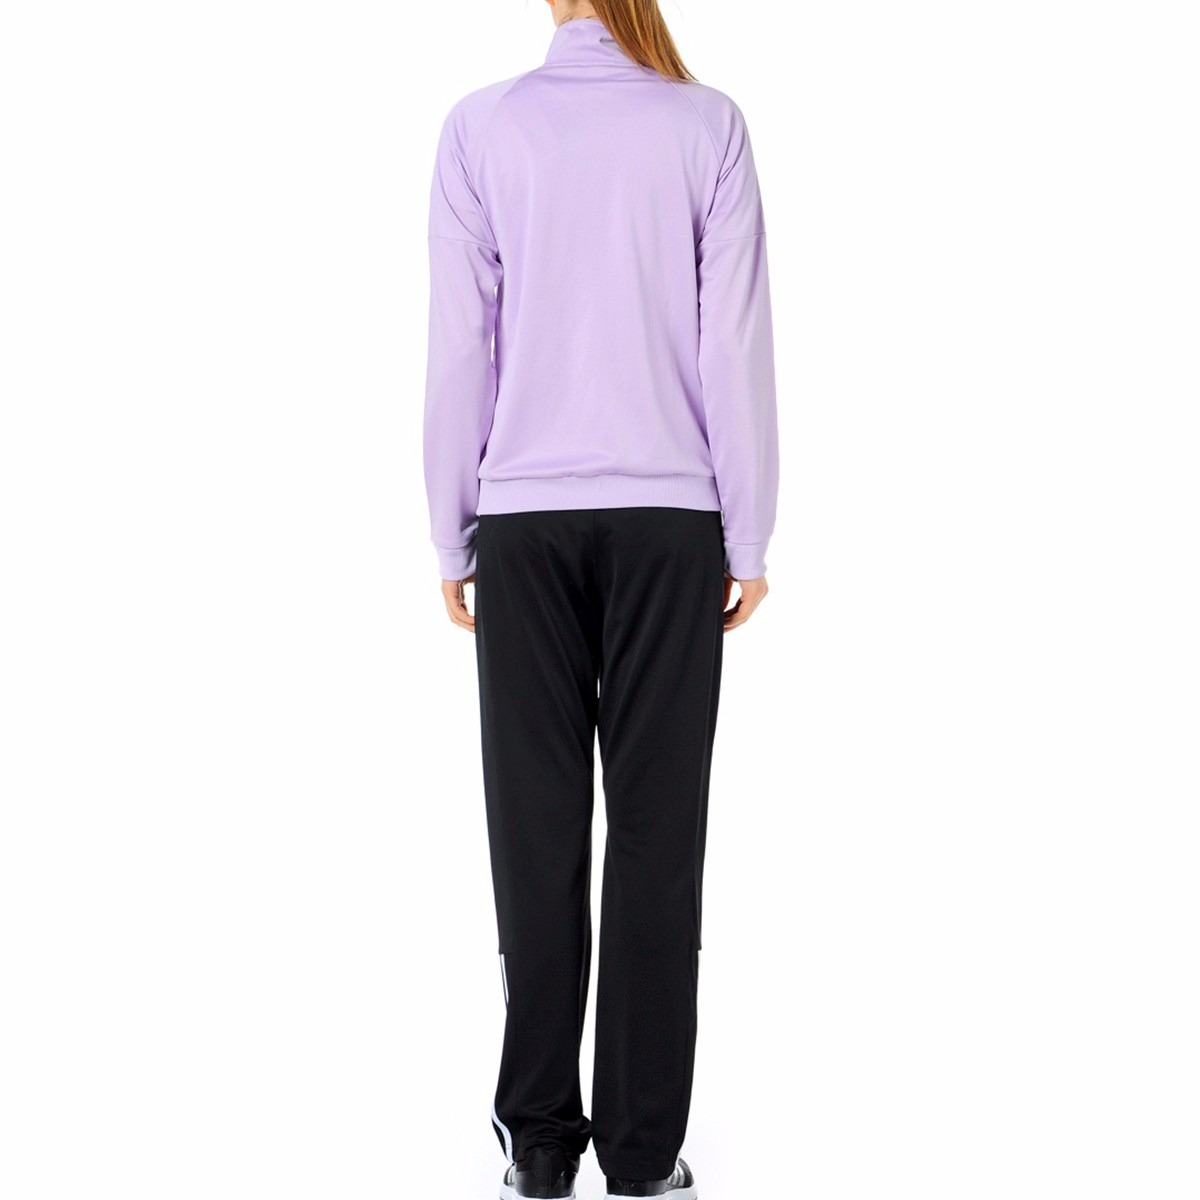 a29c4388385f0 Conjunto Pants Y Sudadera Training Frieda Suit adidas Aj5952 ...